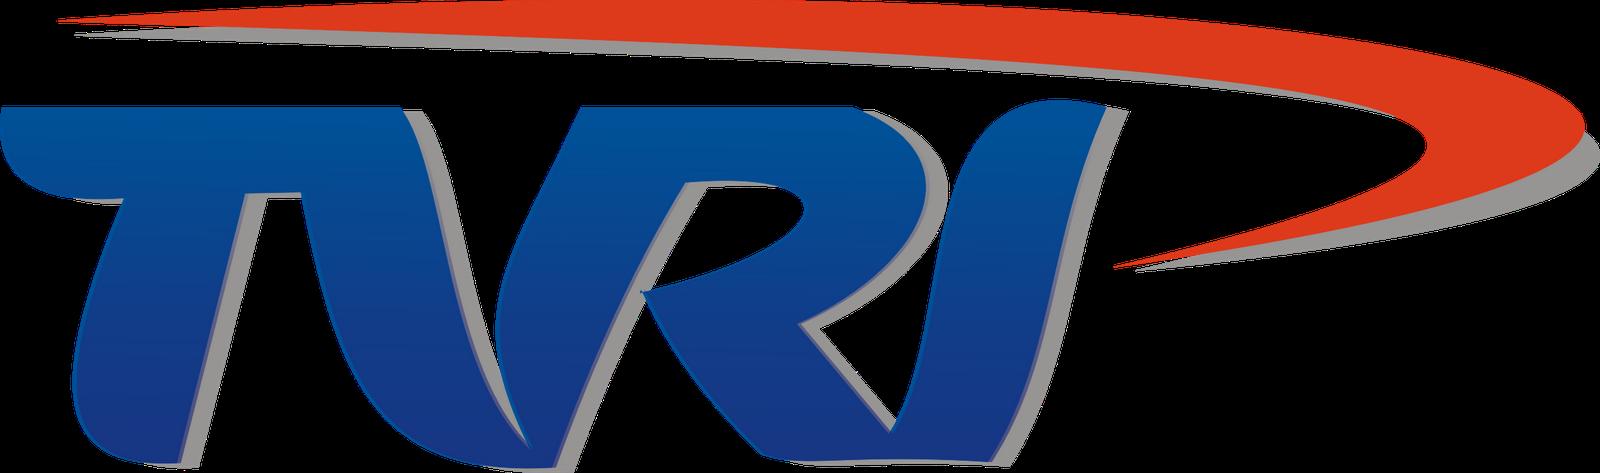 Logo TVRI dari Masa ke Masa - Ardi La Madi's Blog